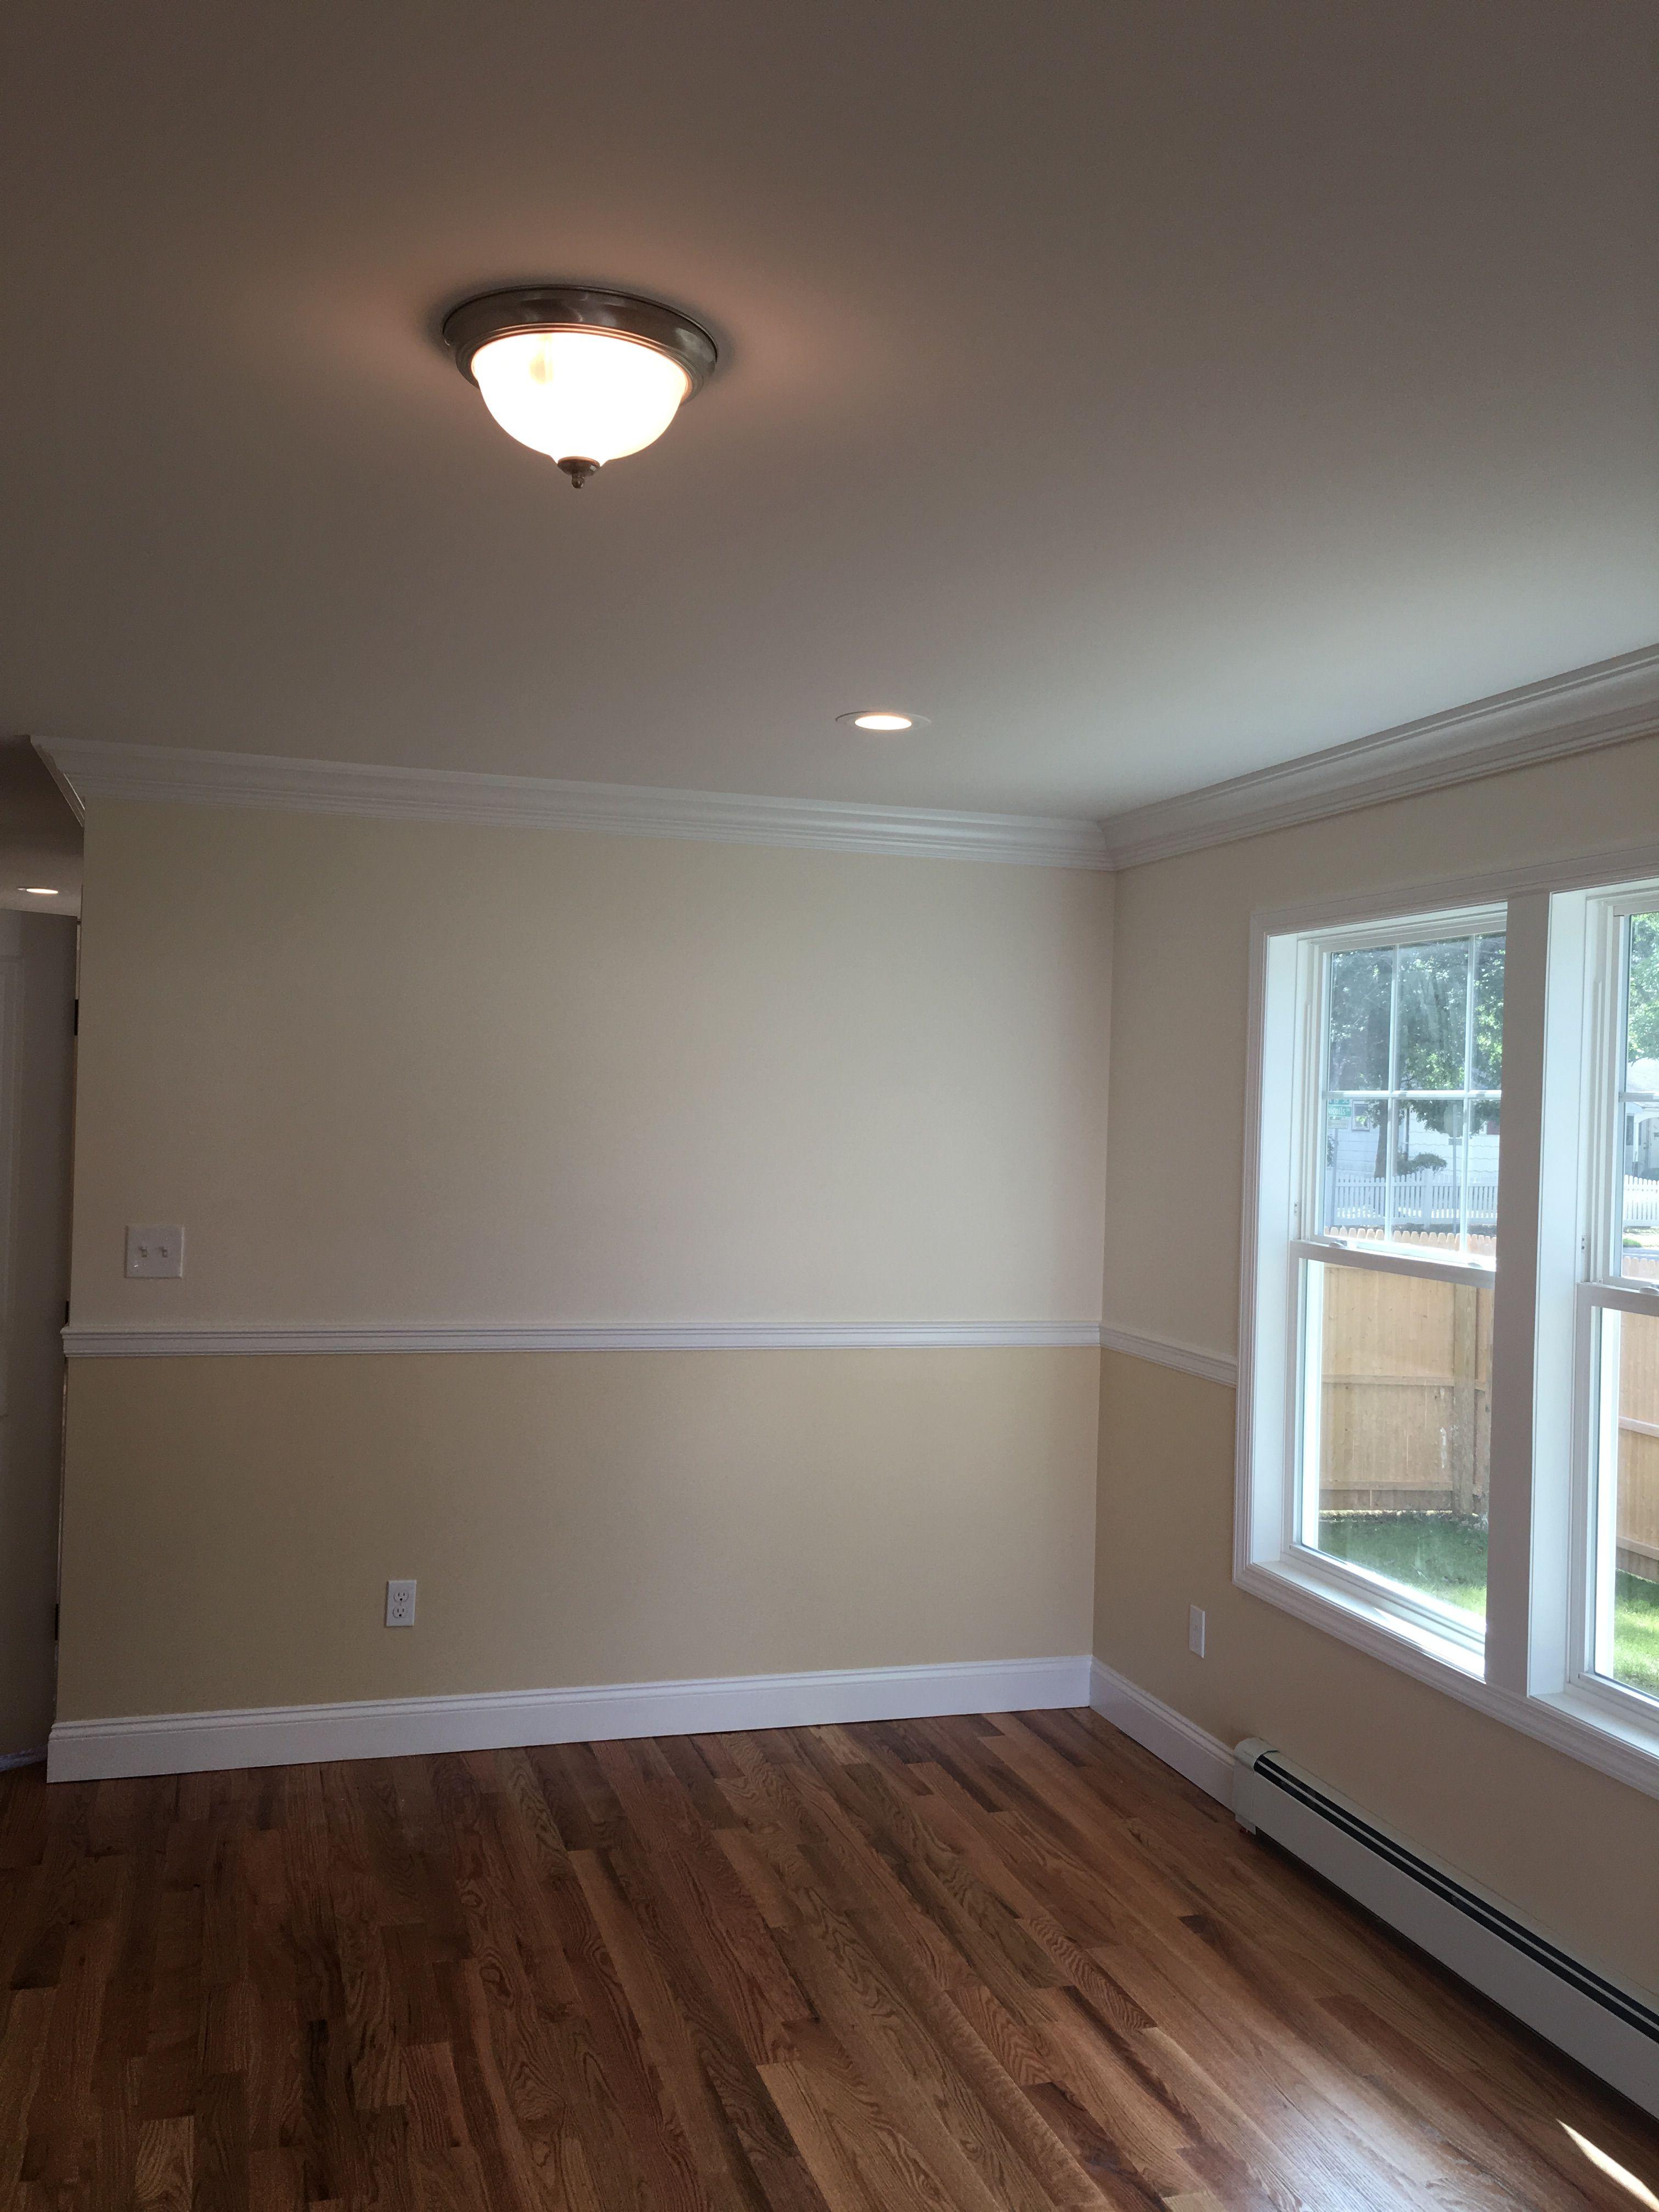 Walls top regal select eggshell linen white 912 bottom - Eggshell paint on walls ...